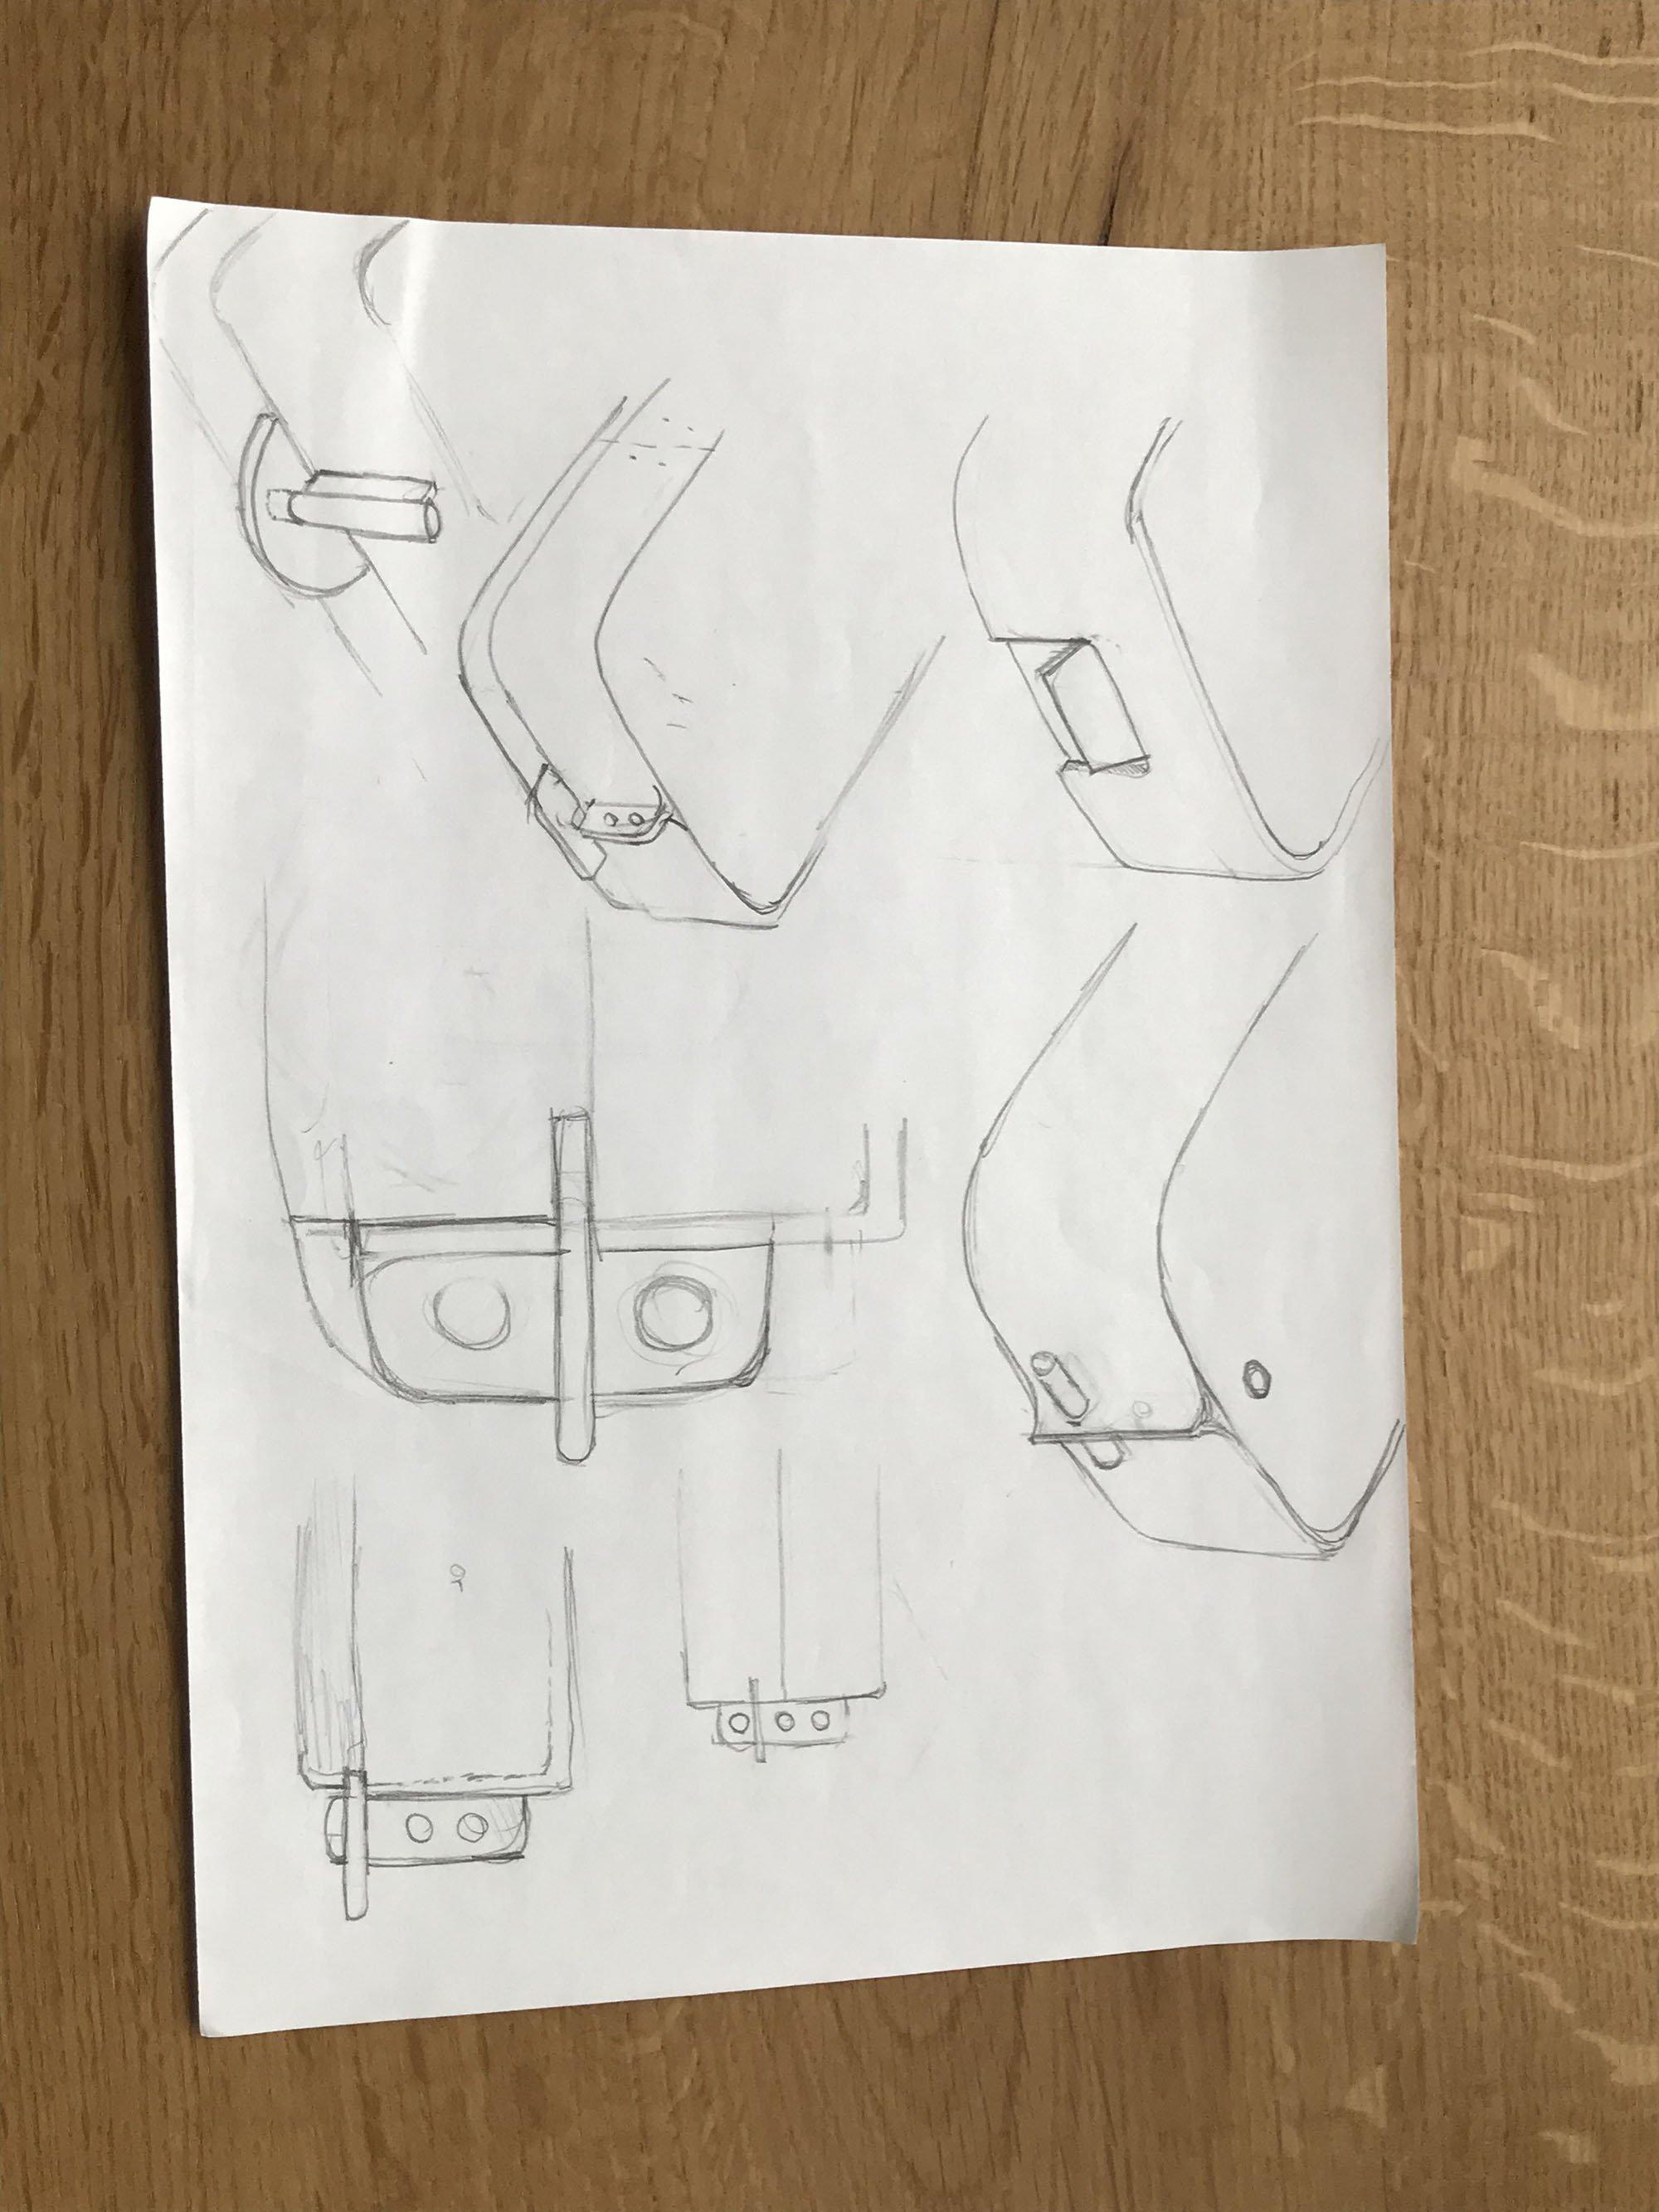 Josh Krute_Toteemi_Sketches 1